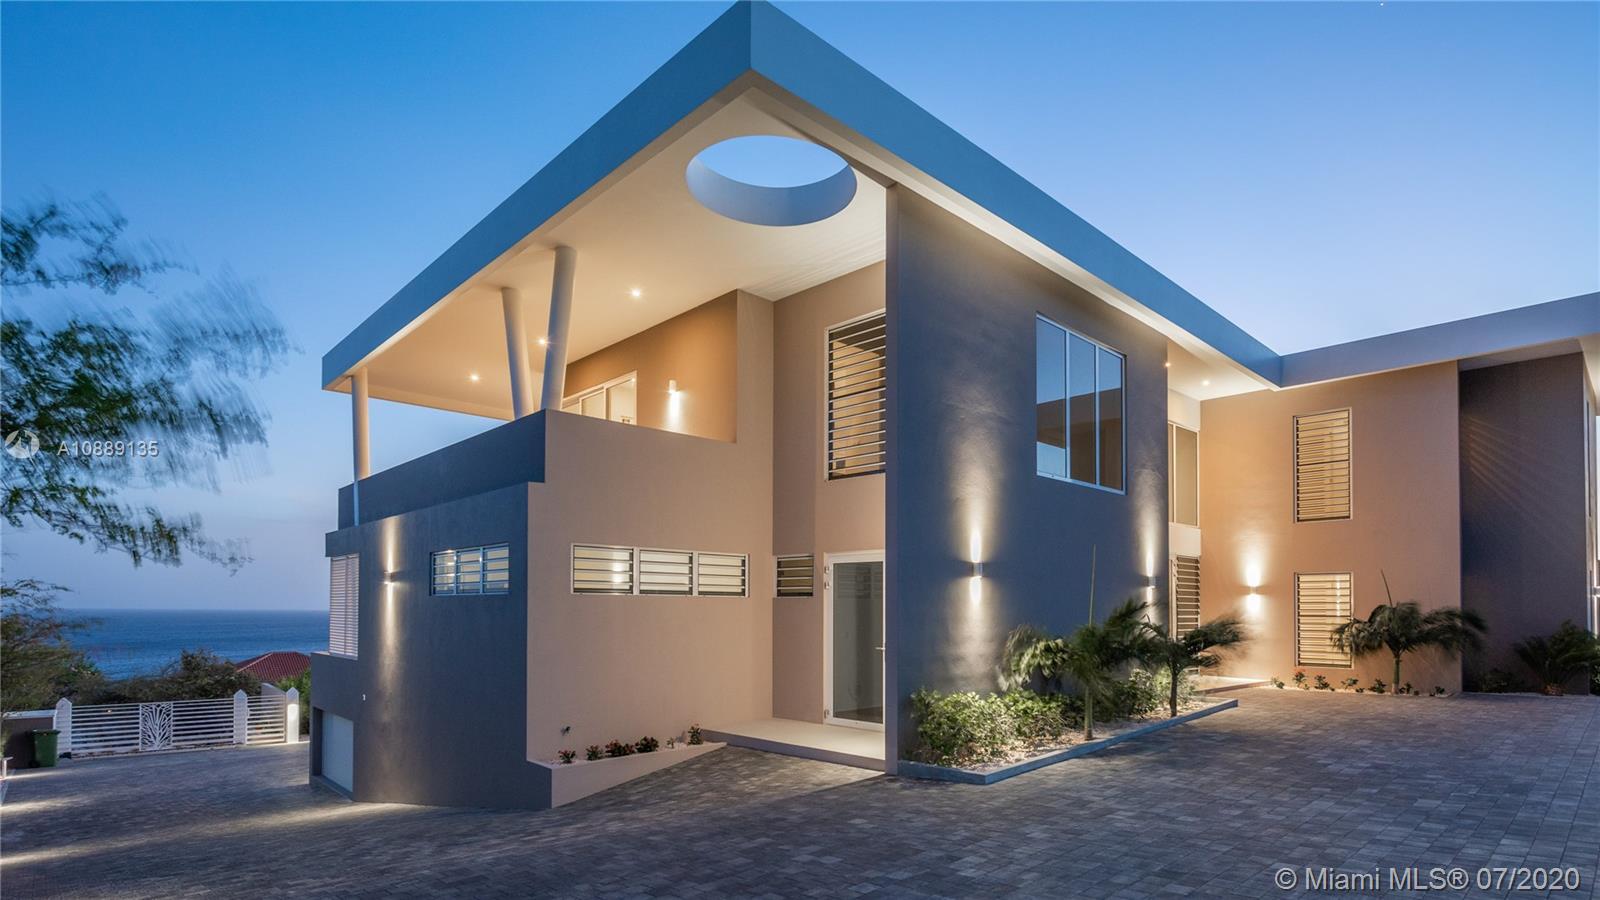 000000 Real Estate Listings Main Image